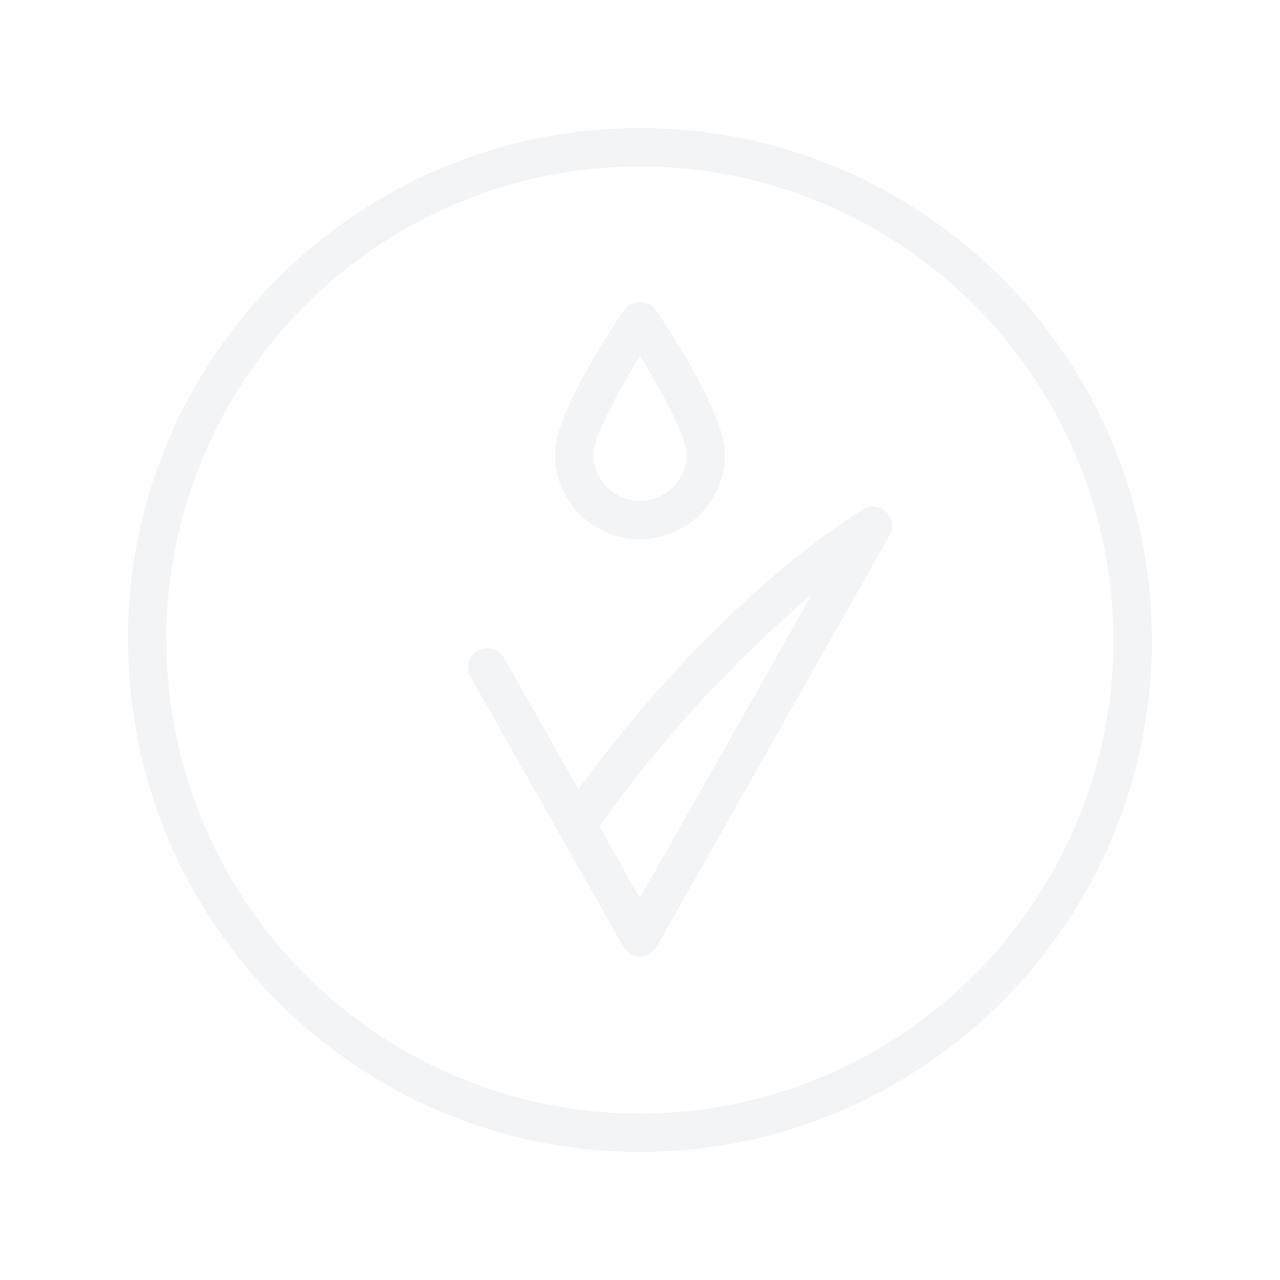 HOLIKA HOLIKA Prime Youth Black Sea Cucumber гидрогелевая маска  25g